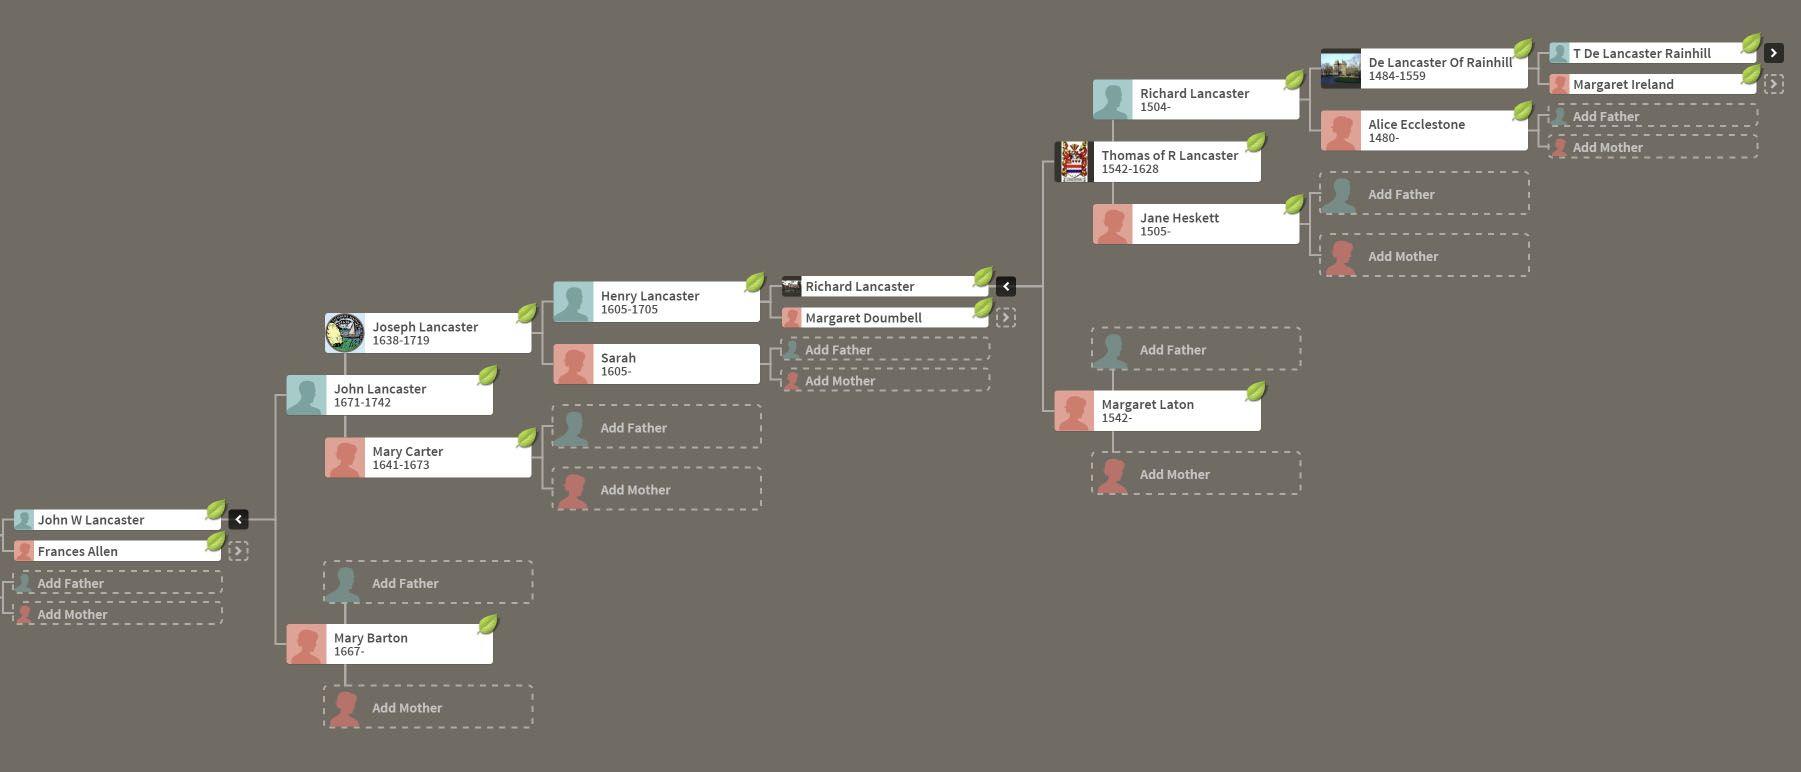 Bradley | Legh family tree